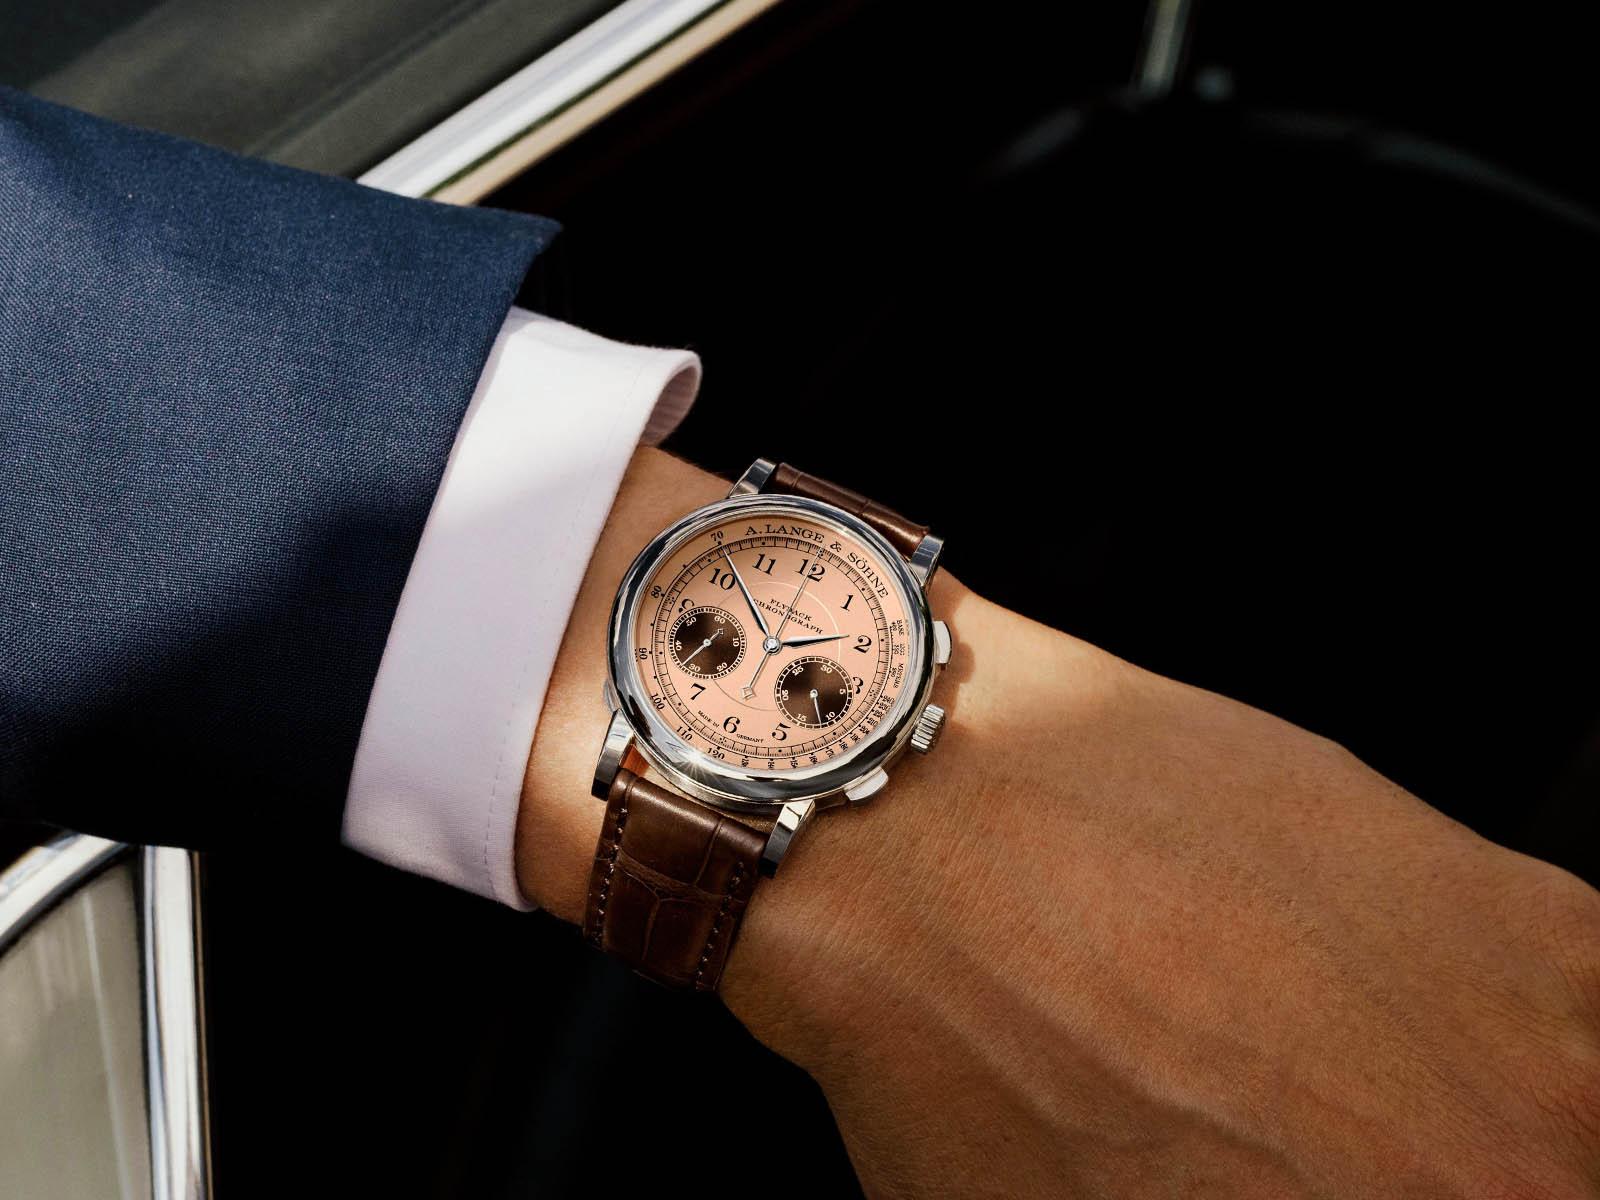 414-049-a-lange-sohne-1815-chronograph-2021-concorso-edition-2.jpg